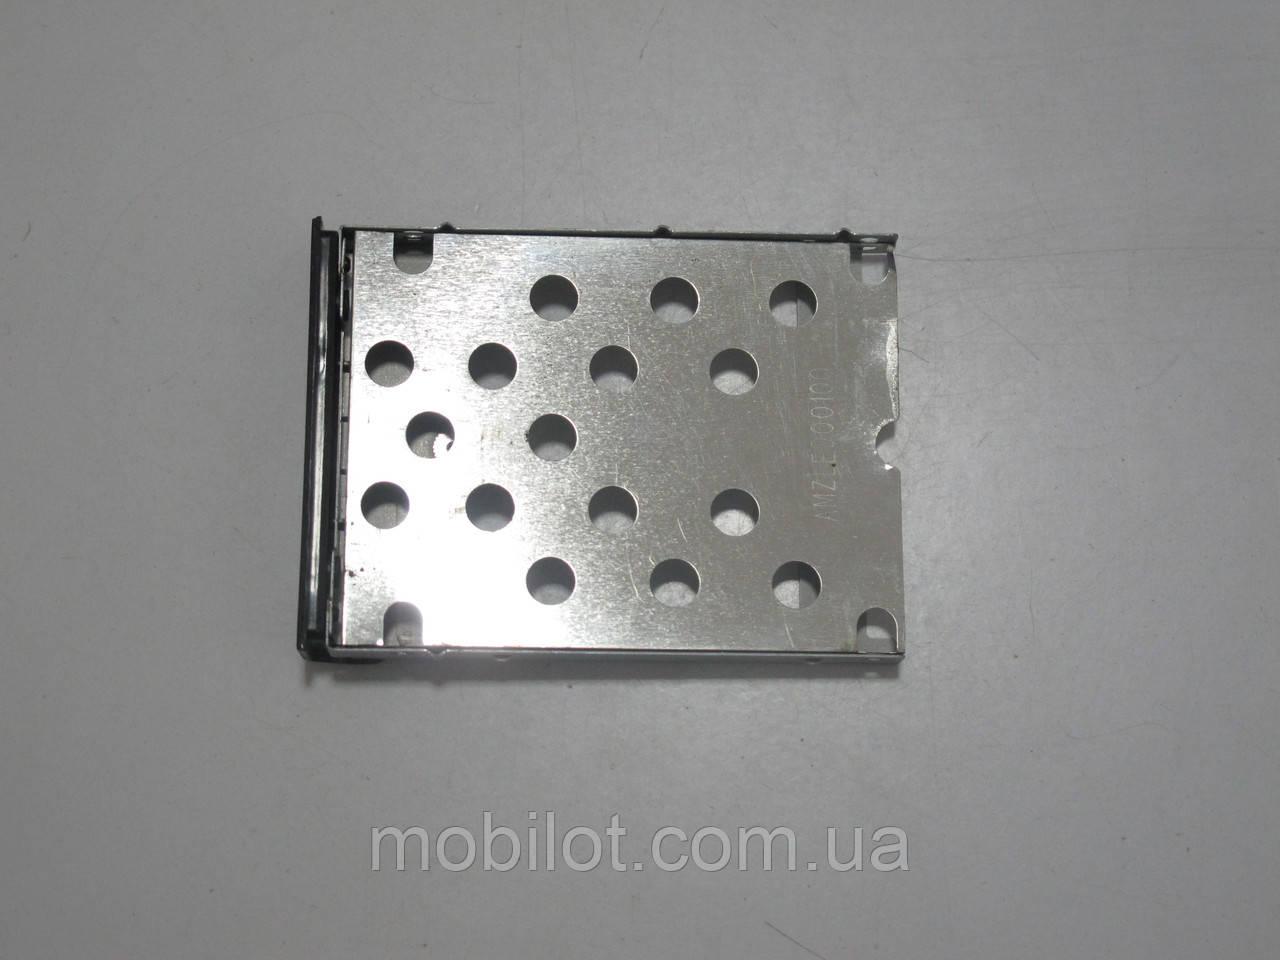 Корпус (карман, корзина, крепление) для HDD Lenovo 3000 C100 (NZ-6774)